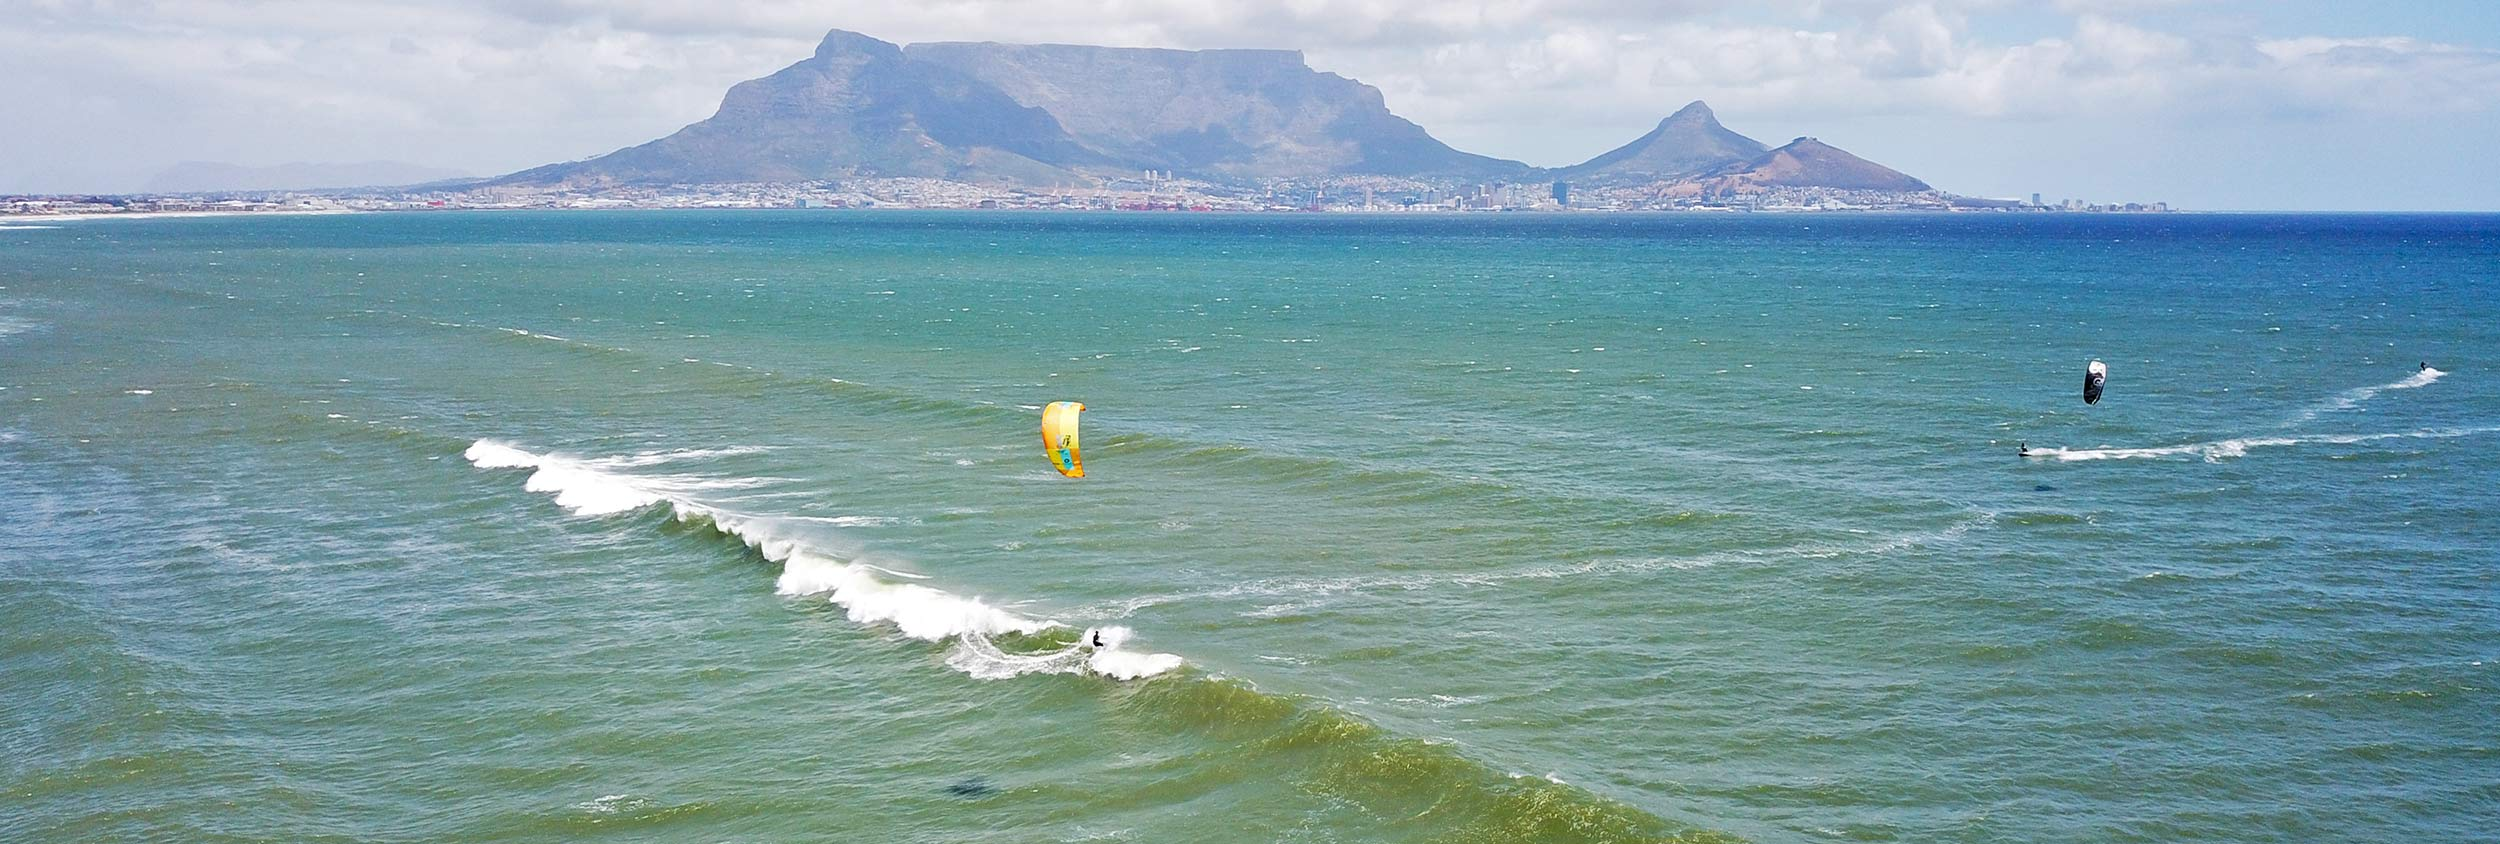 Kitesurfing at Sunset Beach in Cape Town